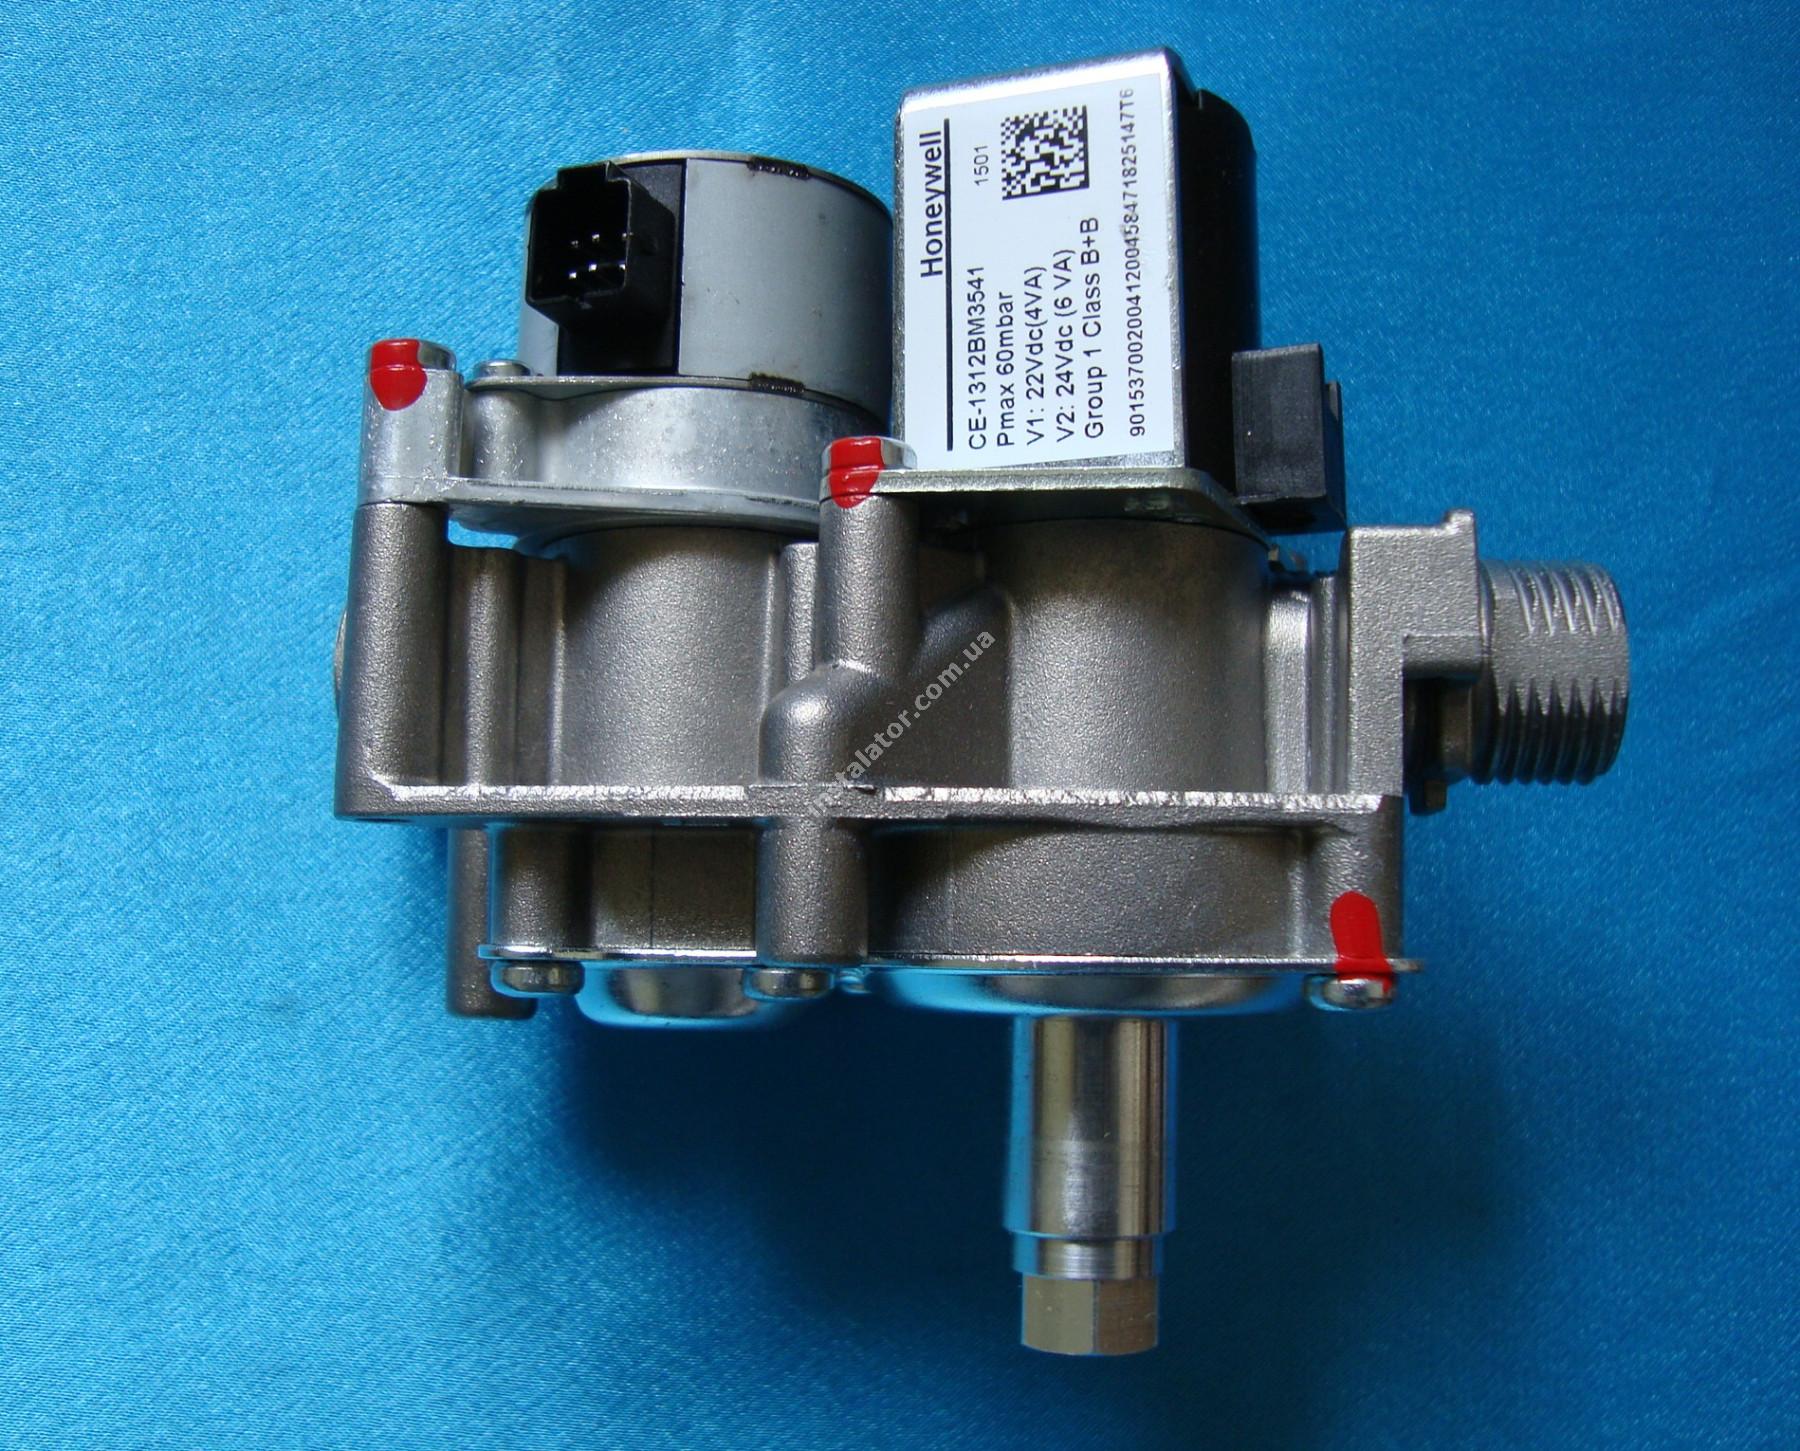 S1071600 Газовий клапан з регулятором SAUNIER DUVAL Themaclassic, Isofast, Combitek  full-image-4